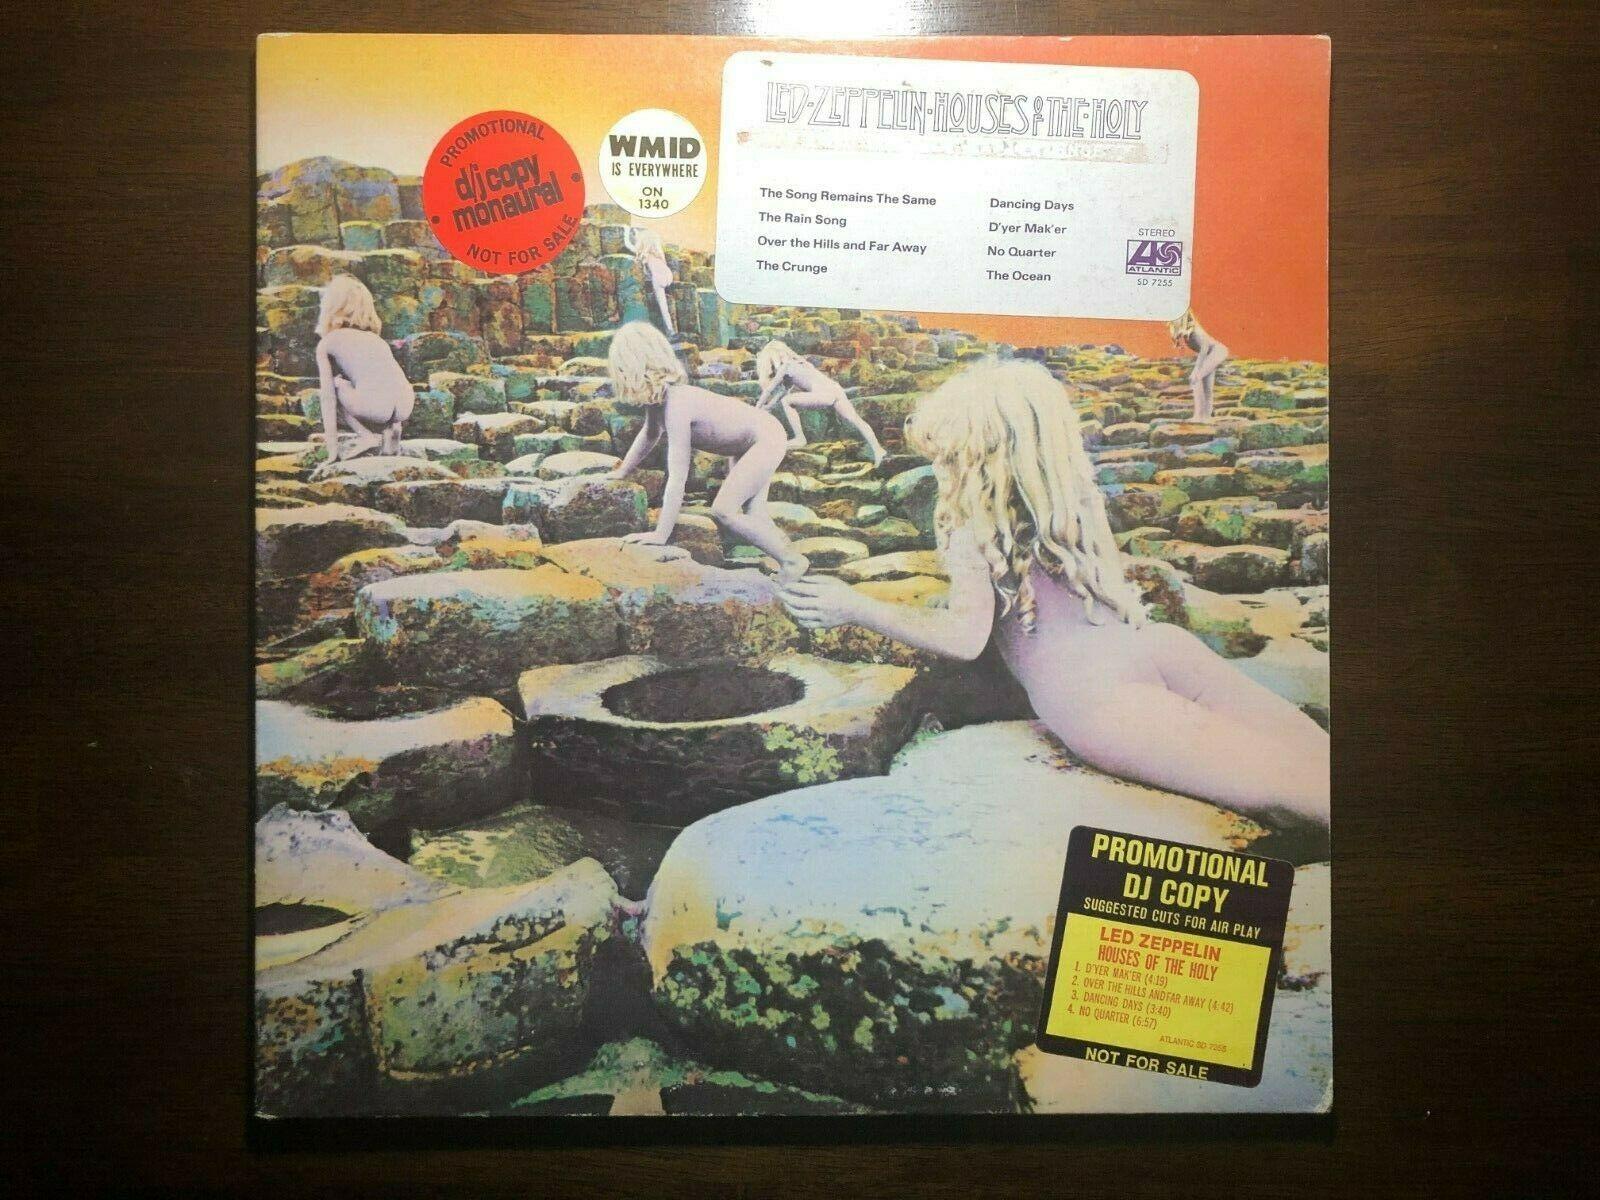 Led Zeppelin Houses of the Holy DJ Promo Vinyl Record Album LP SD 7255 RARE